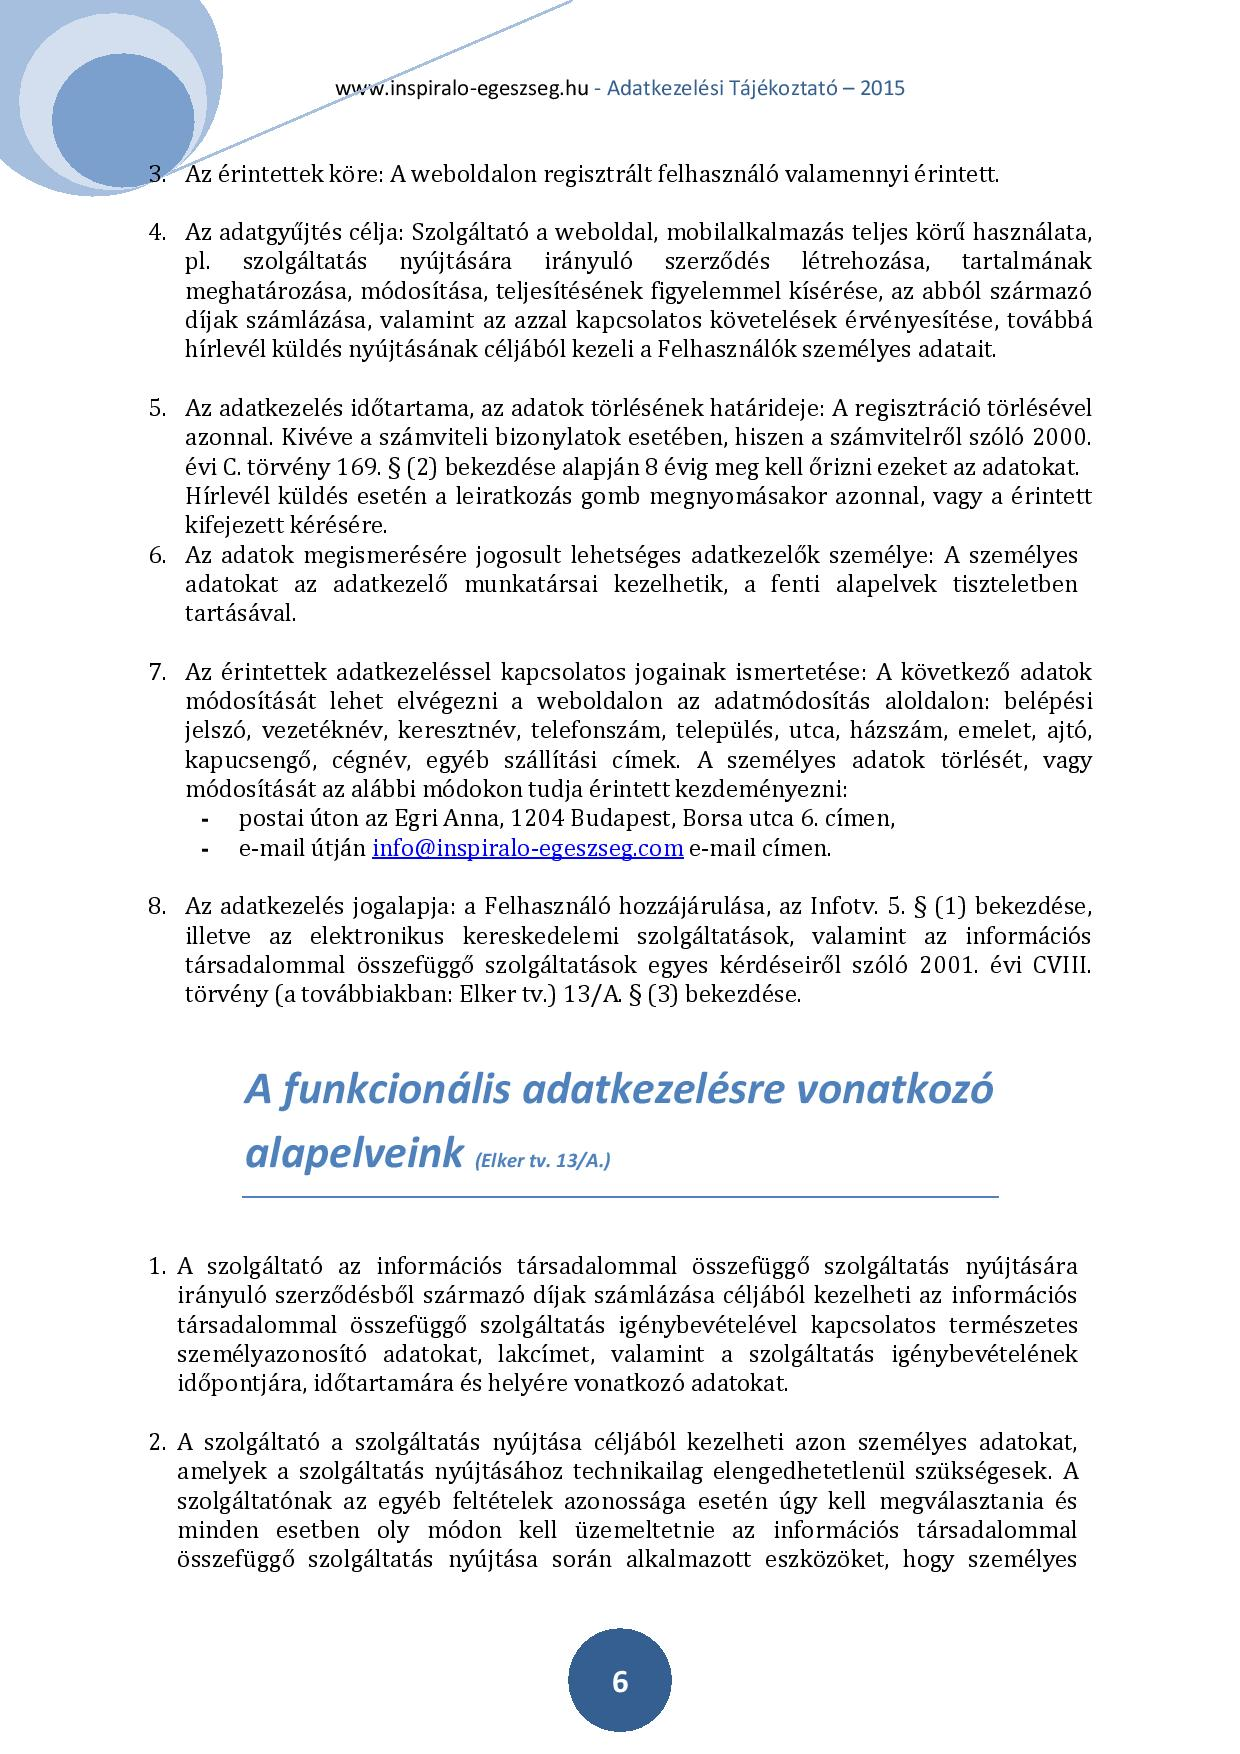 egri-anna-inspiralo-egeszseg-adatvedelmi-page-001